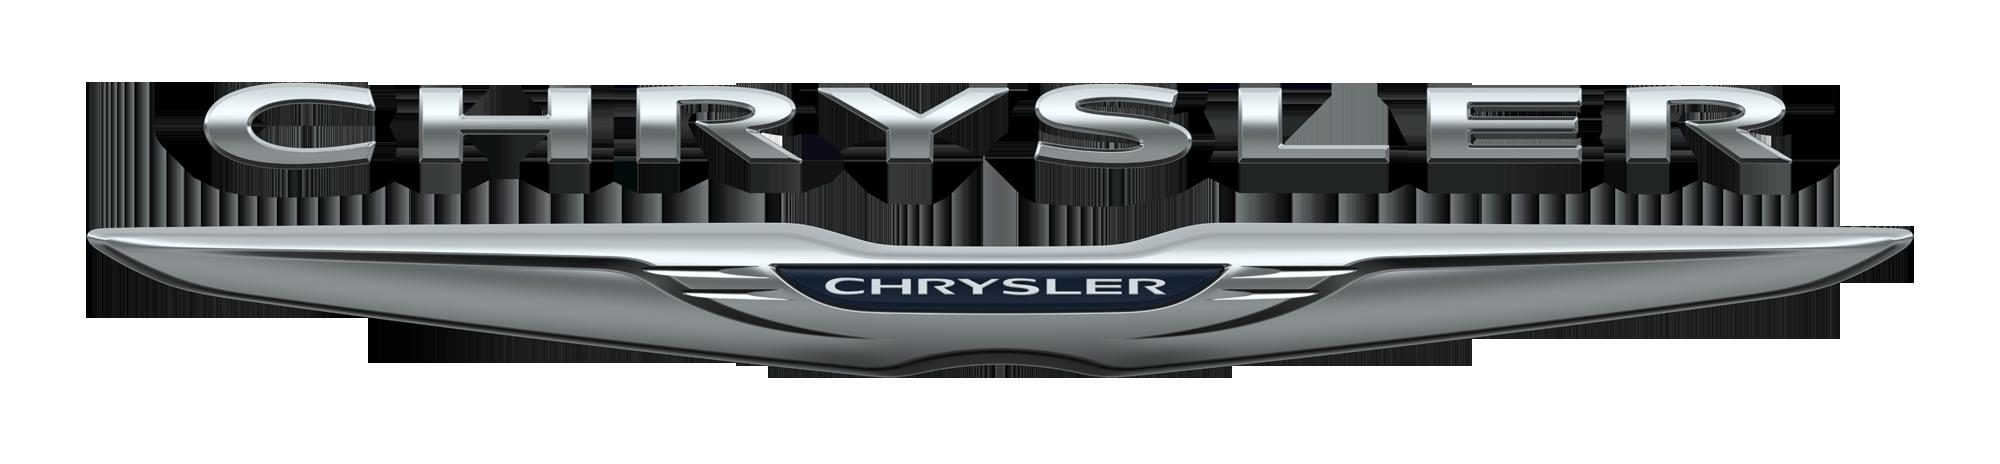 Chrysler PNG - 98909